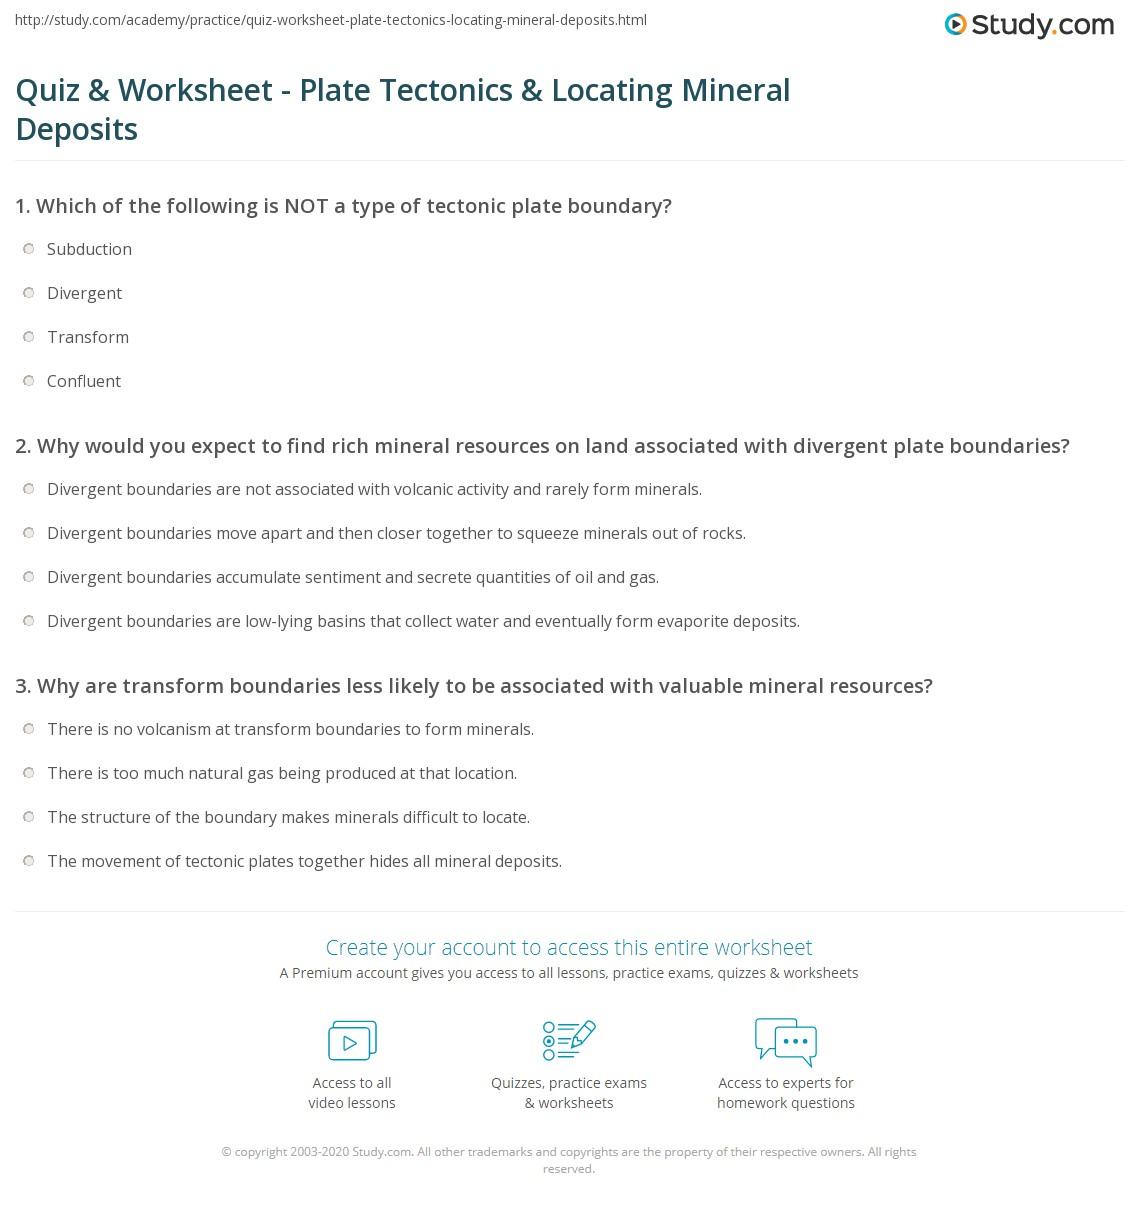 quiz worksheet plate tectonics locating mineral deposits. Black Bedroom Furniture Sets. Home Design Ideas